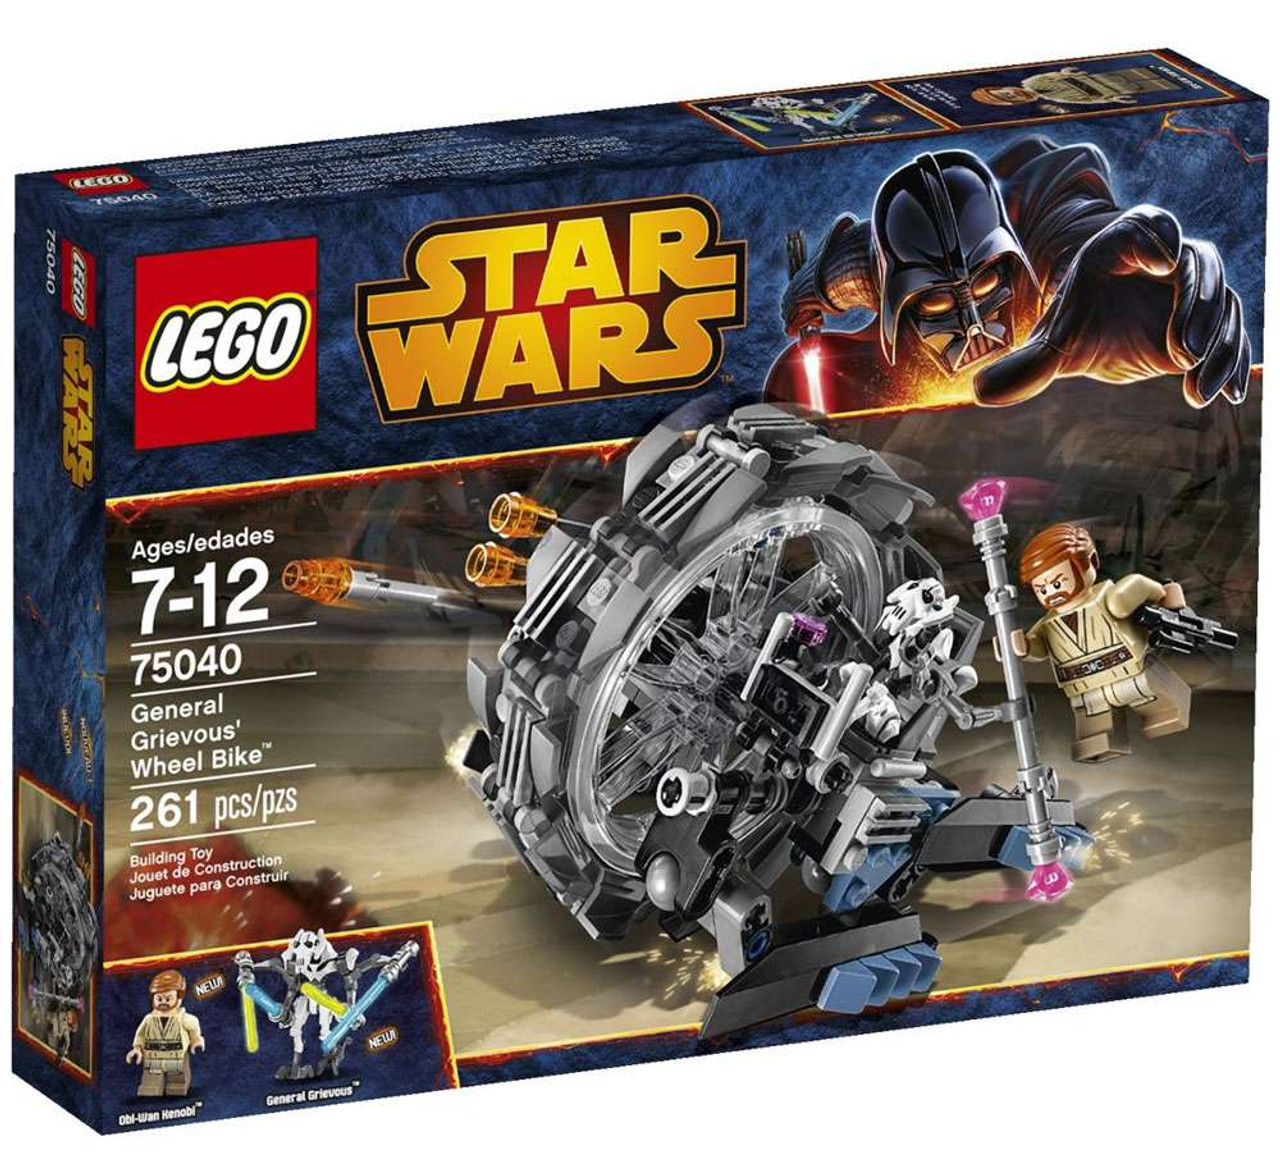 Lego Star Wars Revenge Of The Sith General Grievous Wheel Bike Set 75040 Damaged Package Toywiz